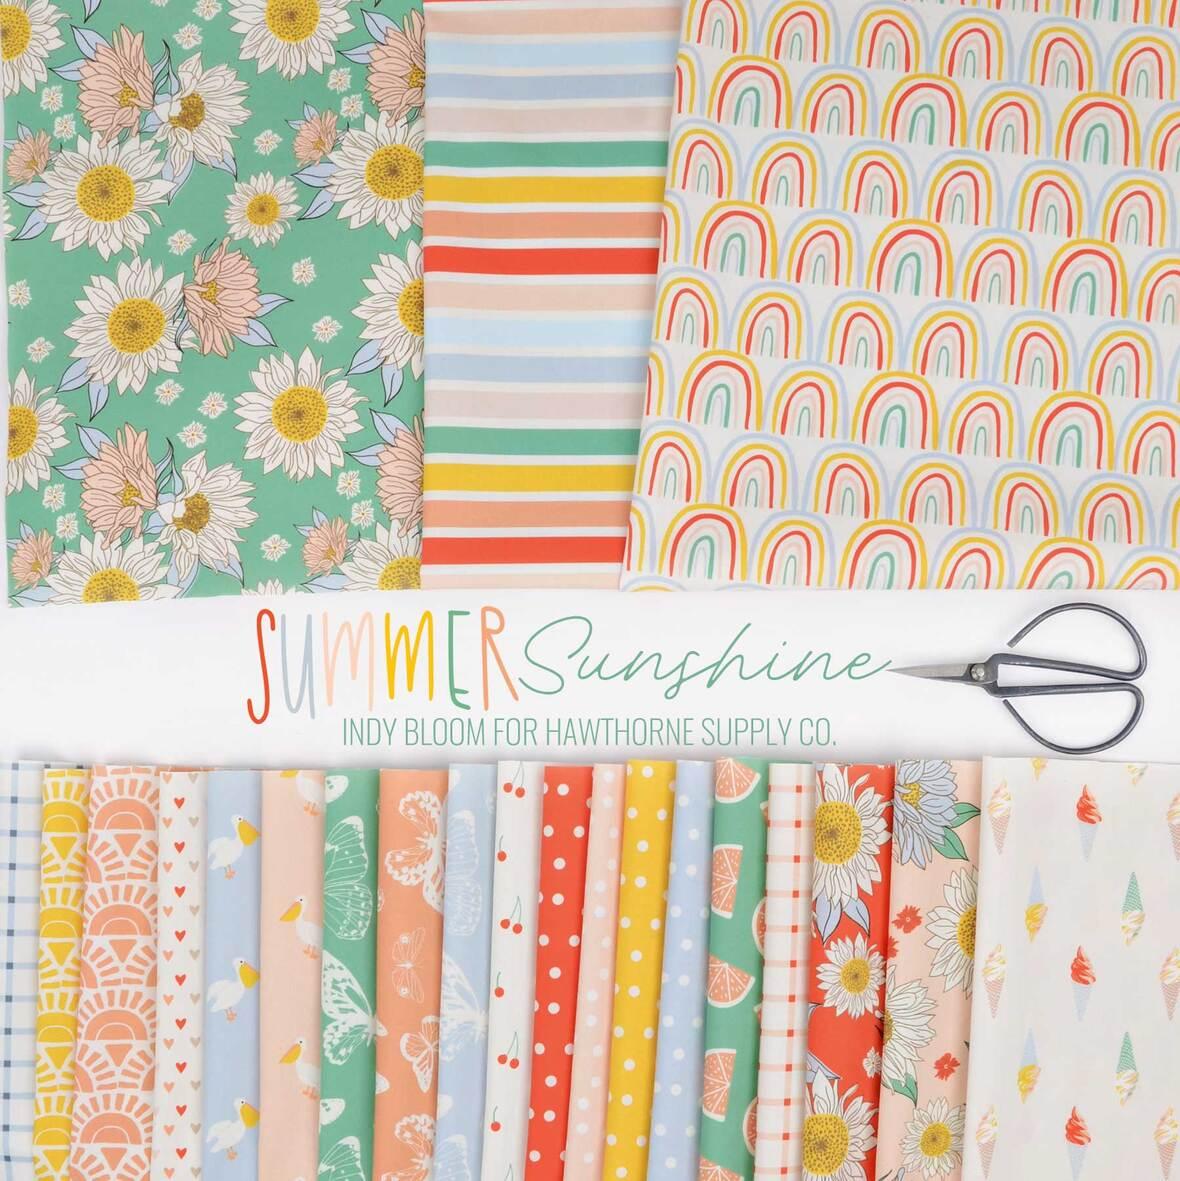 Summer-Sunshine-Indy-Bloom-for-Hawthorne-Supply-Co.